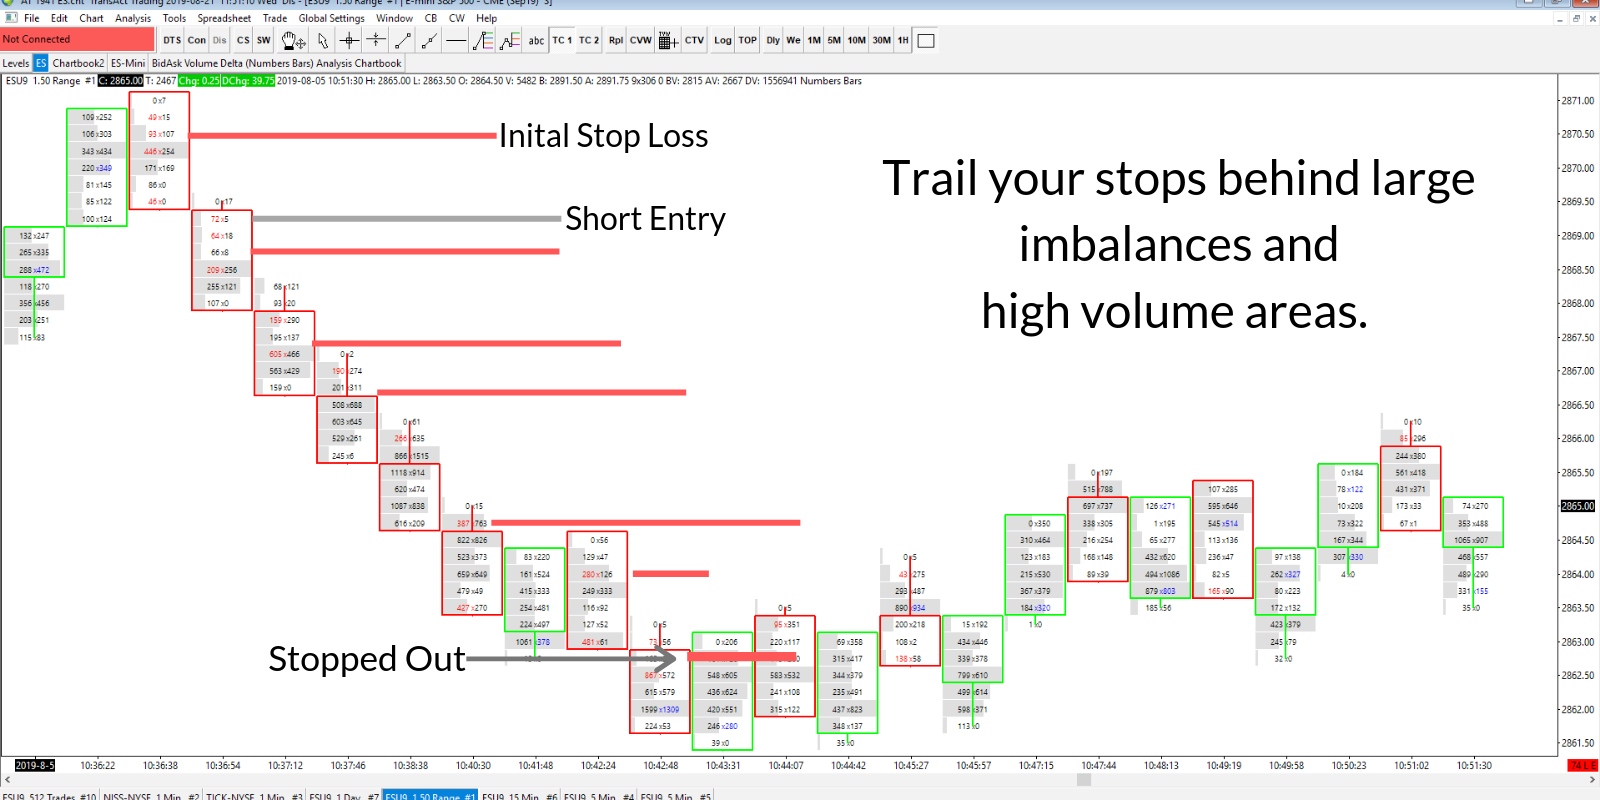 Trail Stops Behind Imbalances